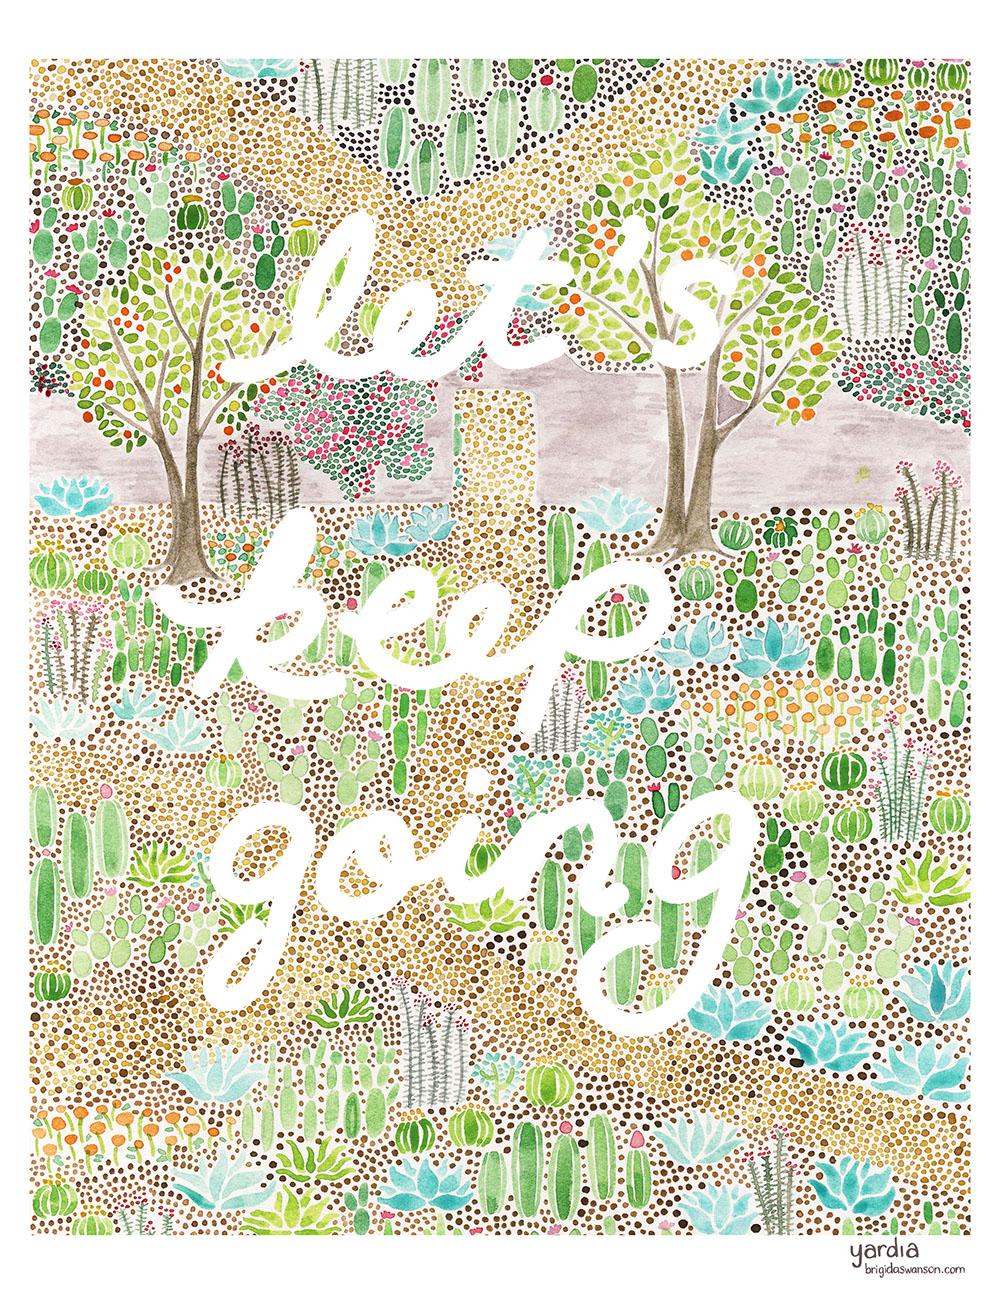 Yardia Lets Keep Going Art Print